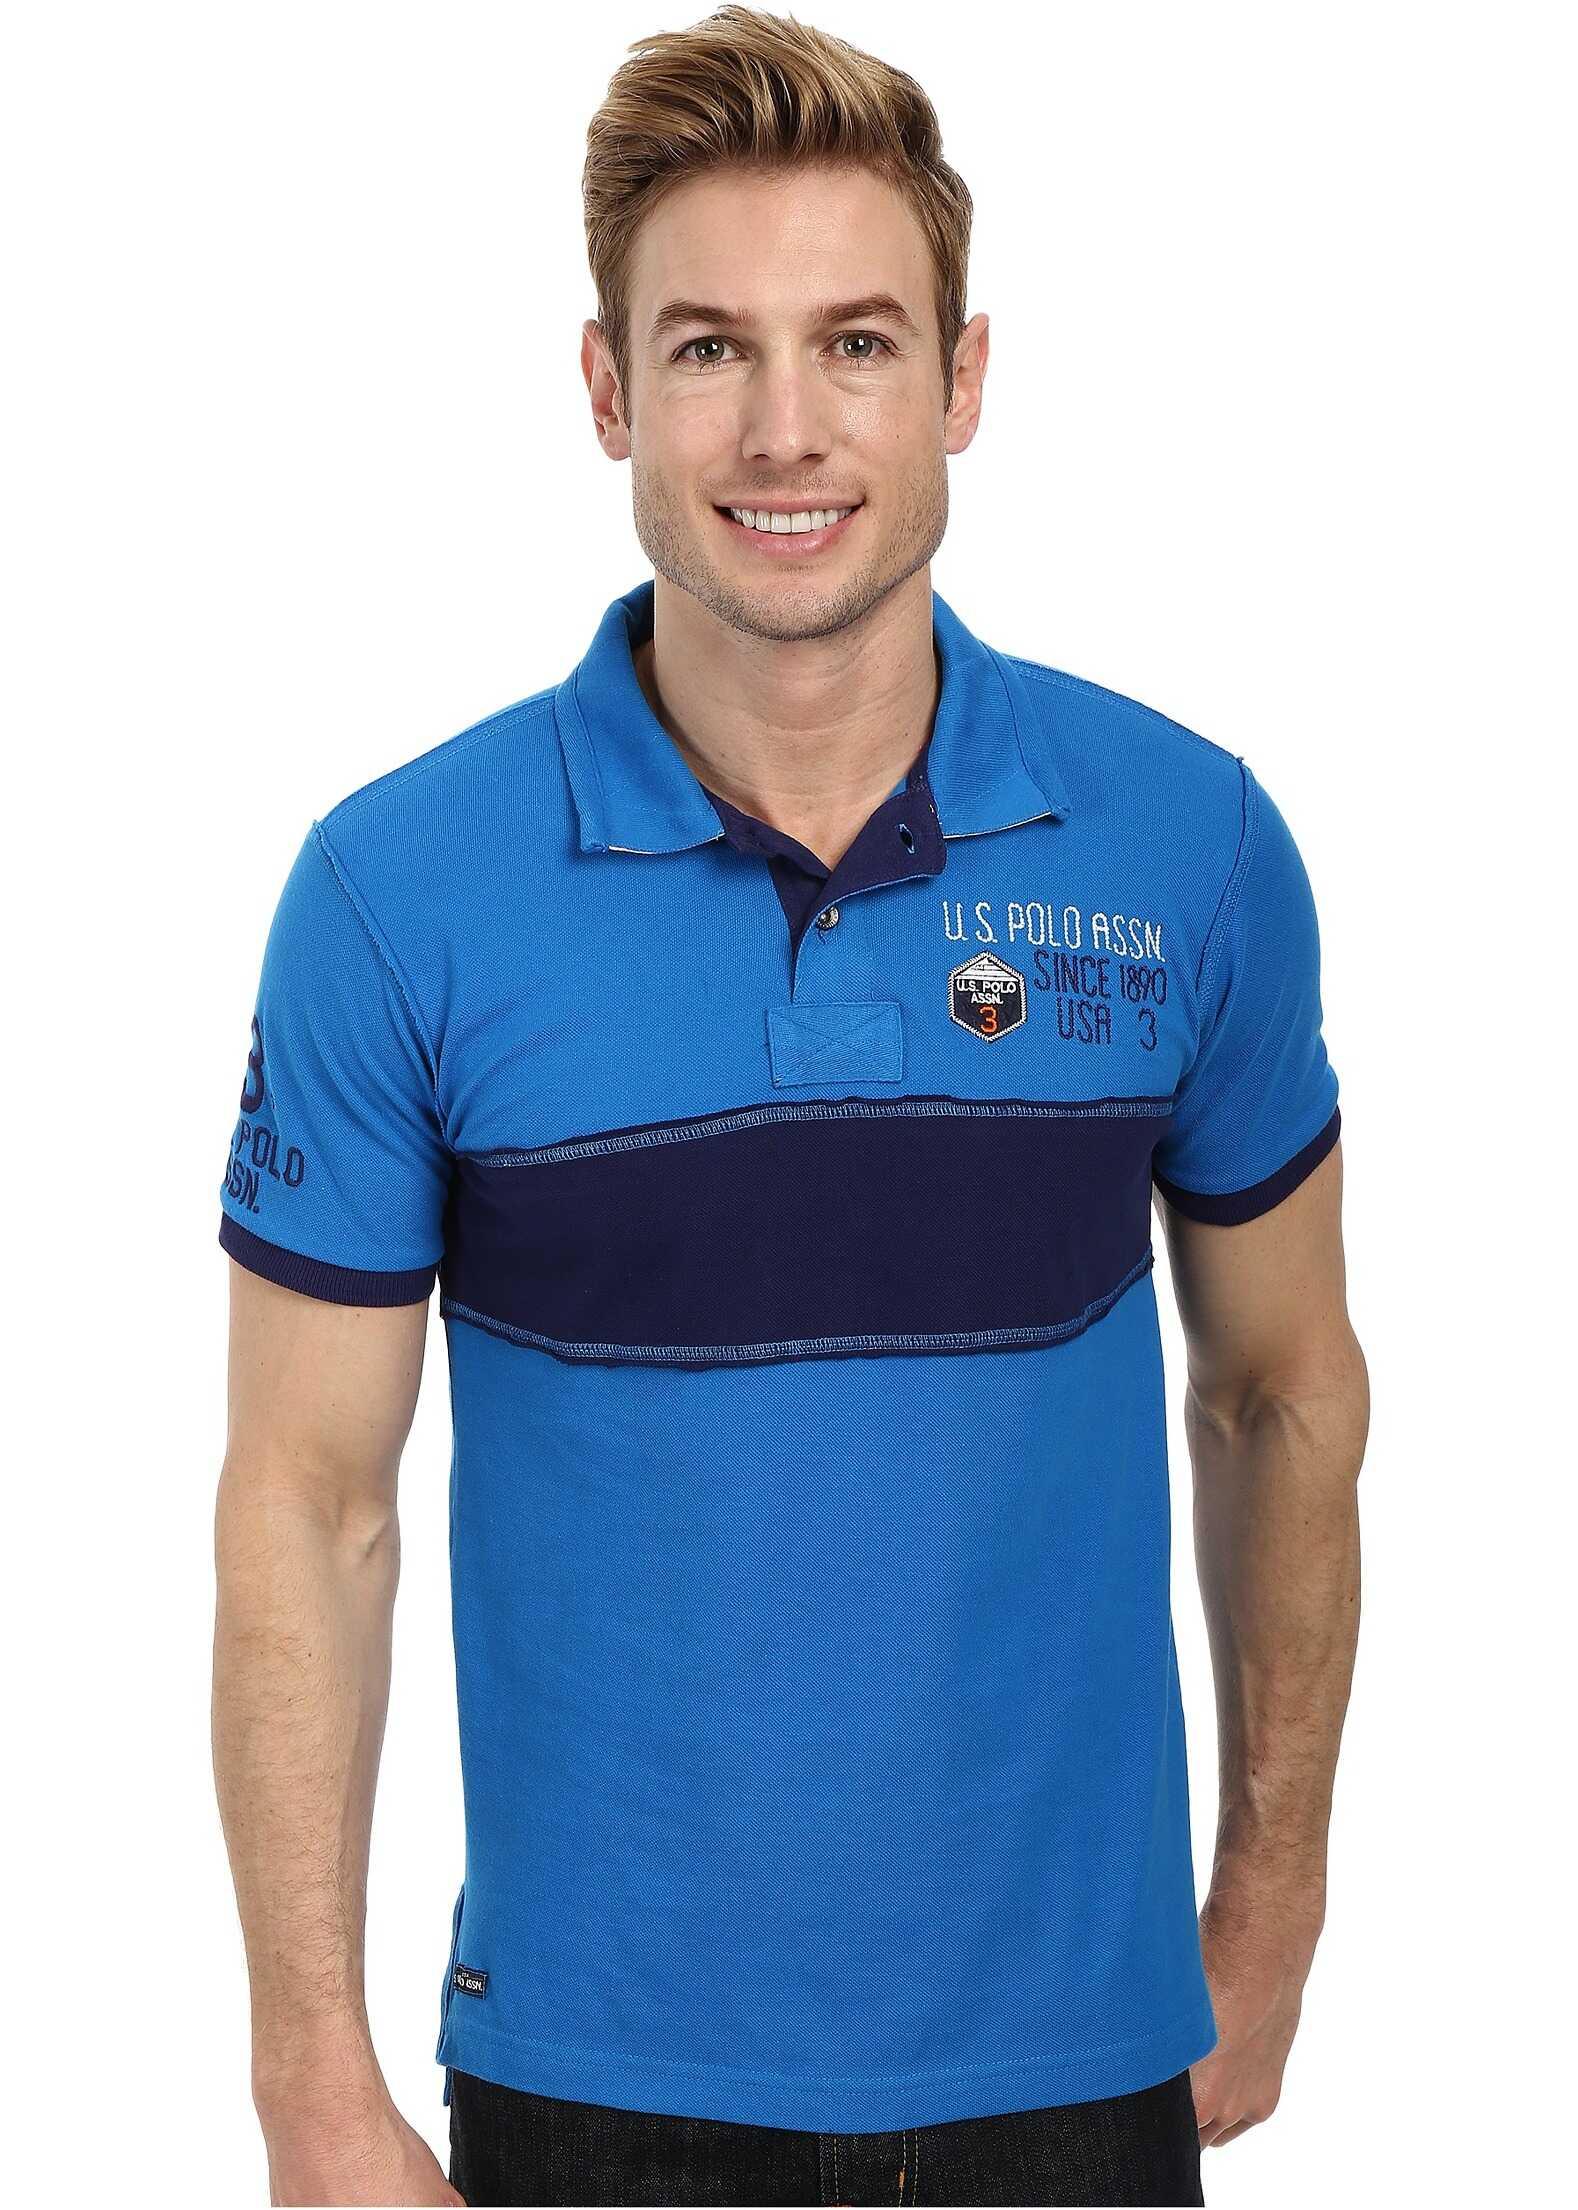 U.S. POLO ASSN. Chest Stripe Slim Fit Polo Blue Tile